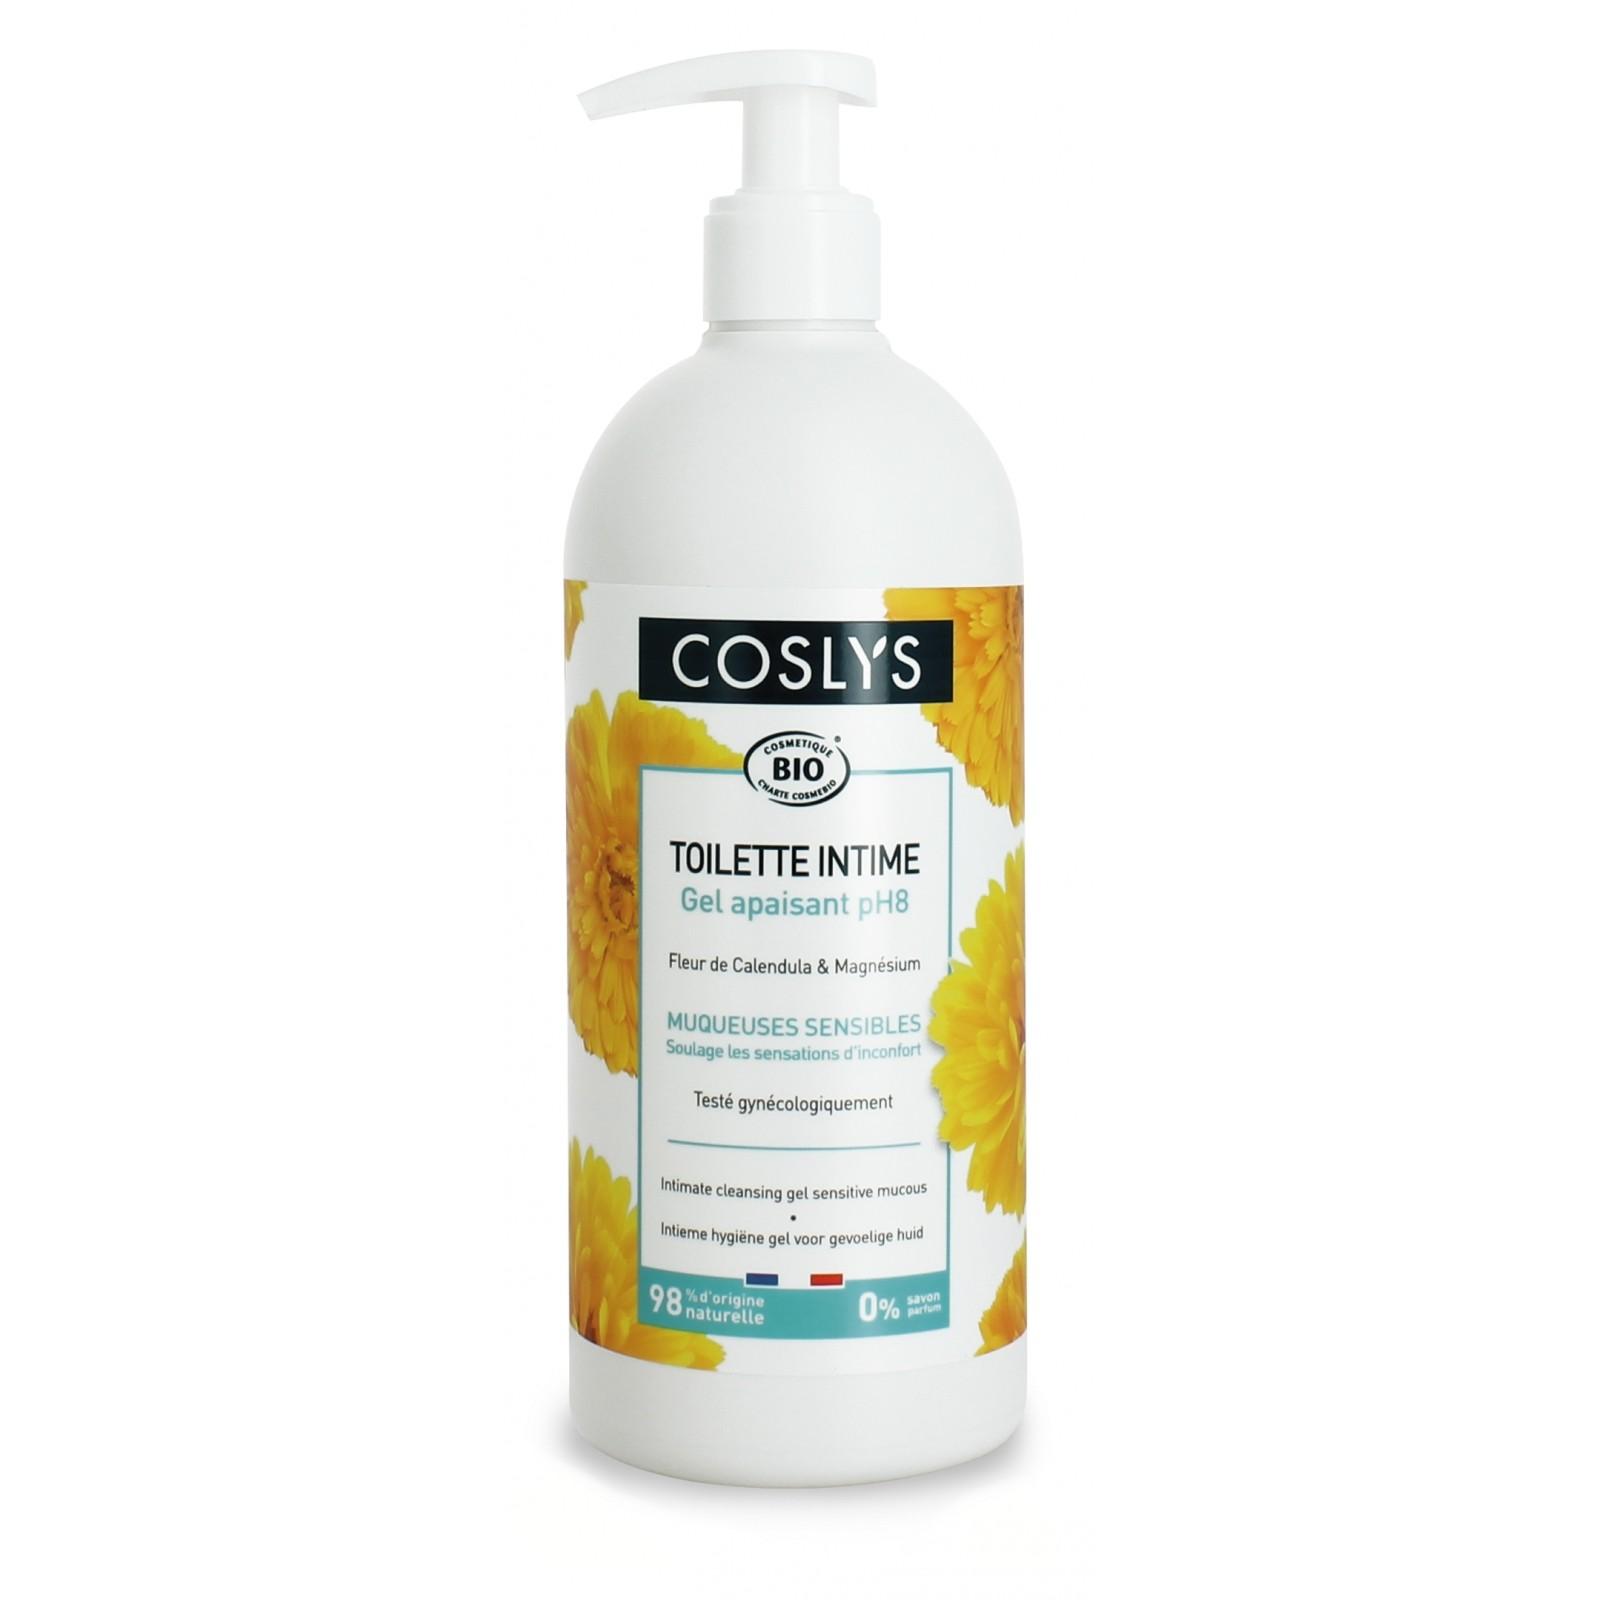 COSLYS Toilette intime gel hypoallergénique BIO - 450 ml